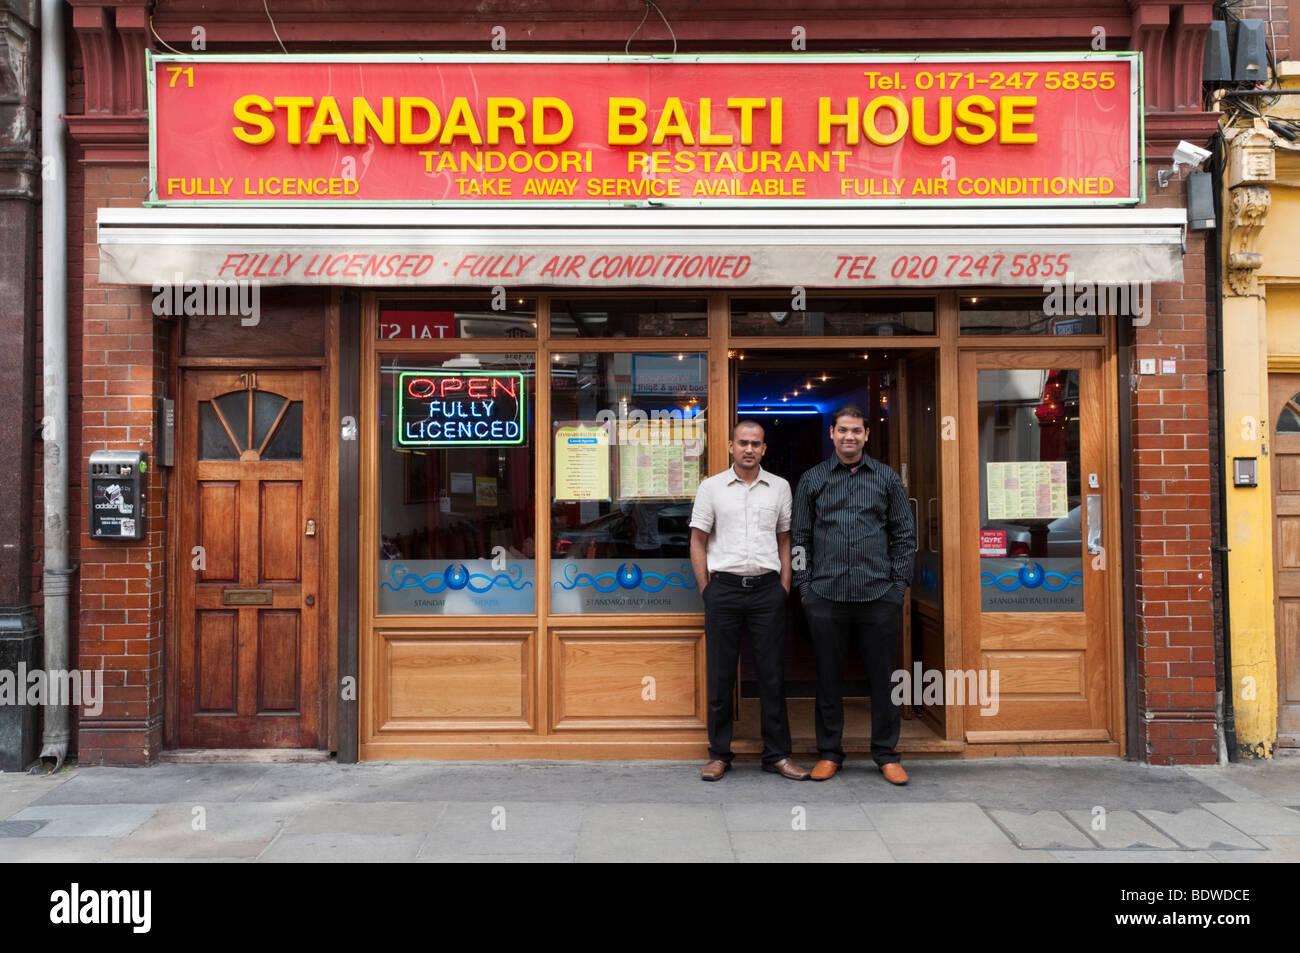 Staff standing outside their Bangladeshi curry and balti restaurant on Brick Lane, Tower Hamlets, London, England, - Stock Image